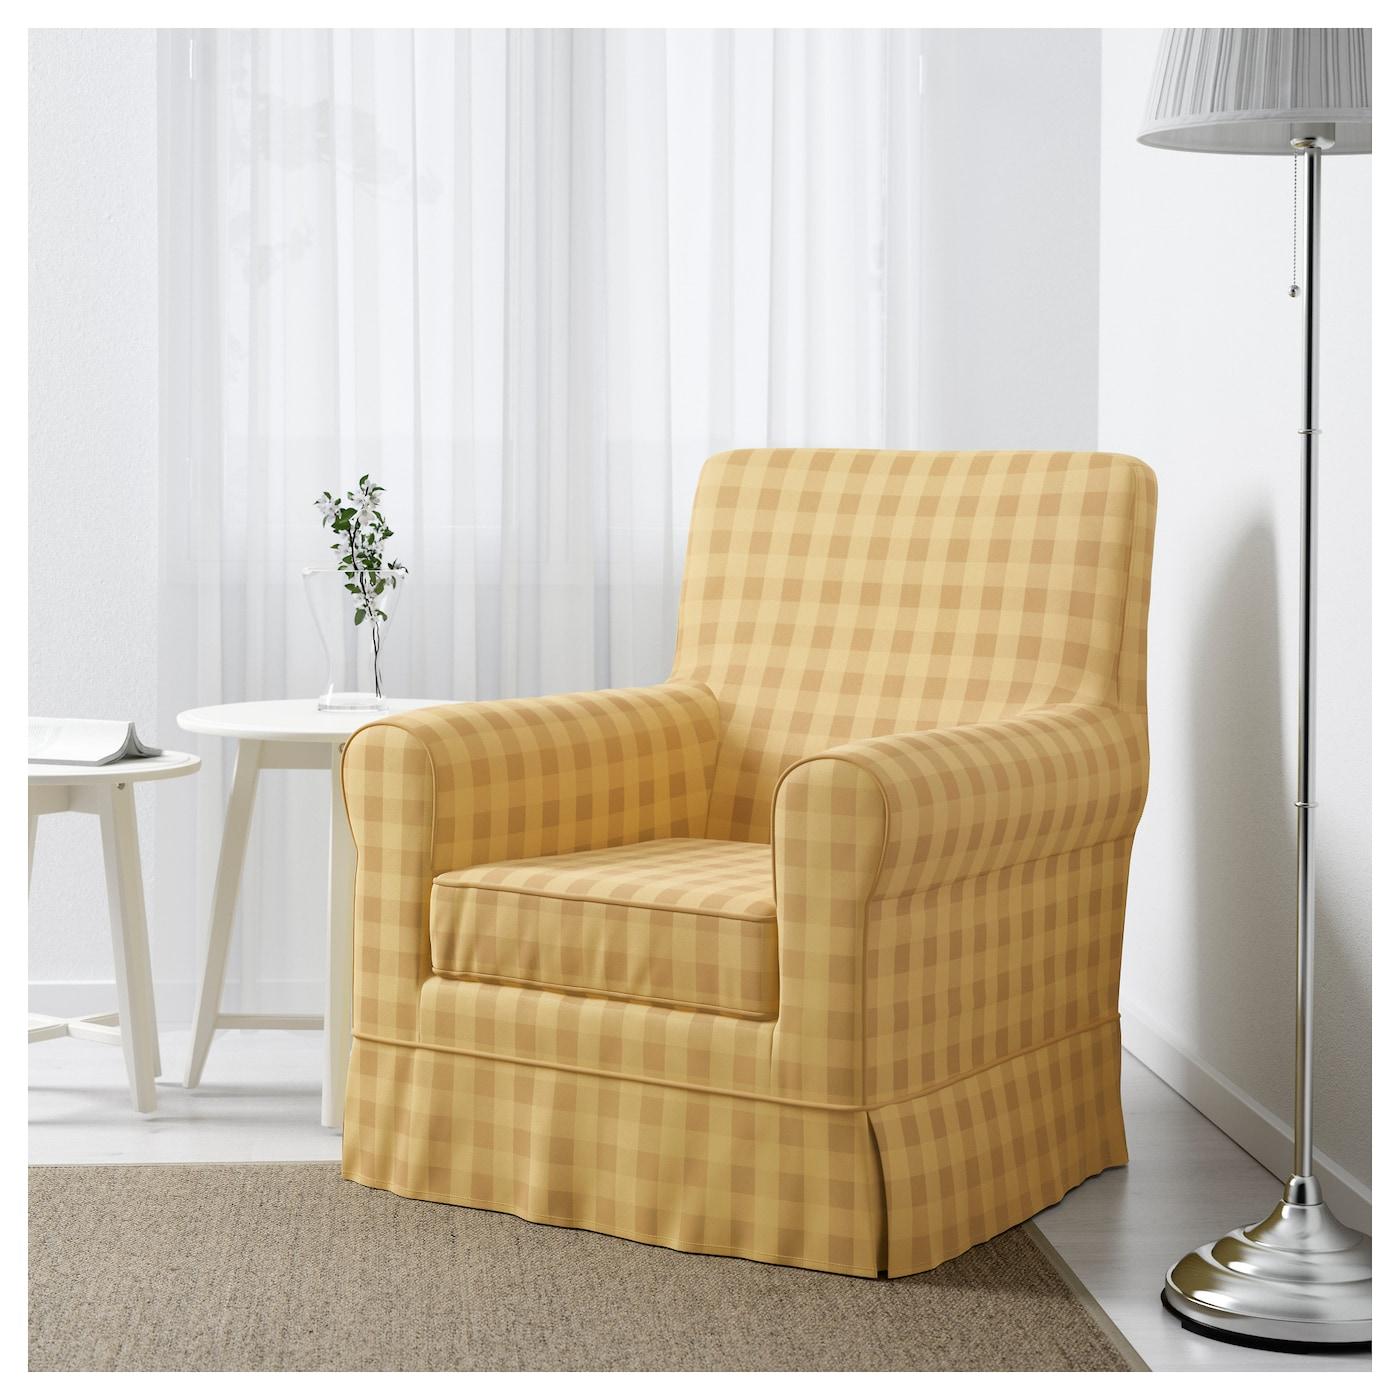 ikea fauteuil jaune awesome chaise jaune ikea fauteuil bebe alinea toulon petite incroyable. Black Bedroom Furniture Sets. Home Design Ideas